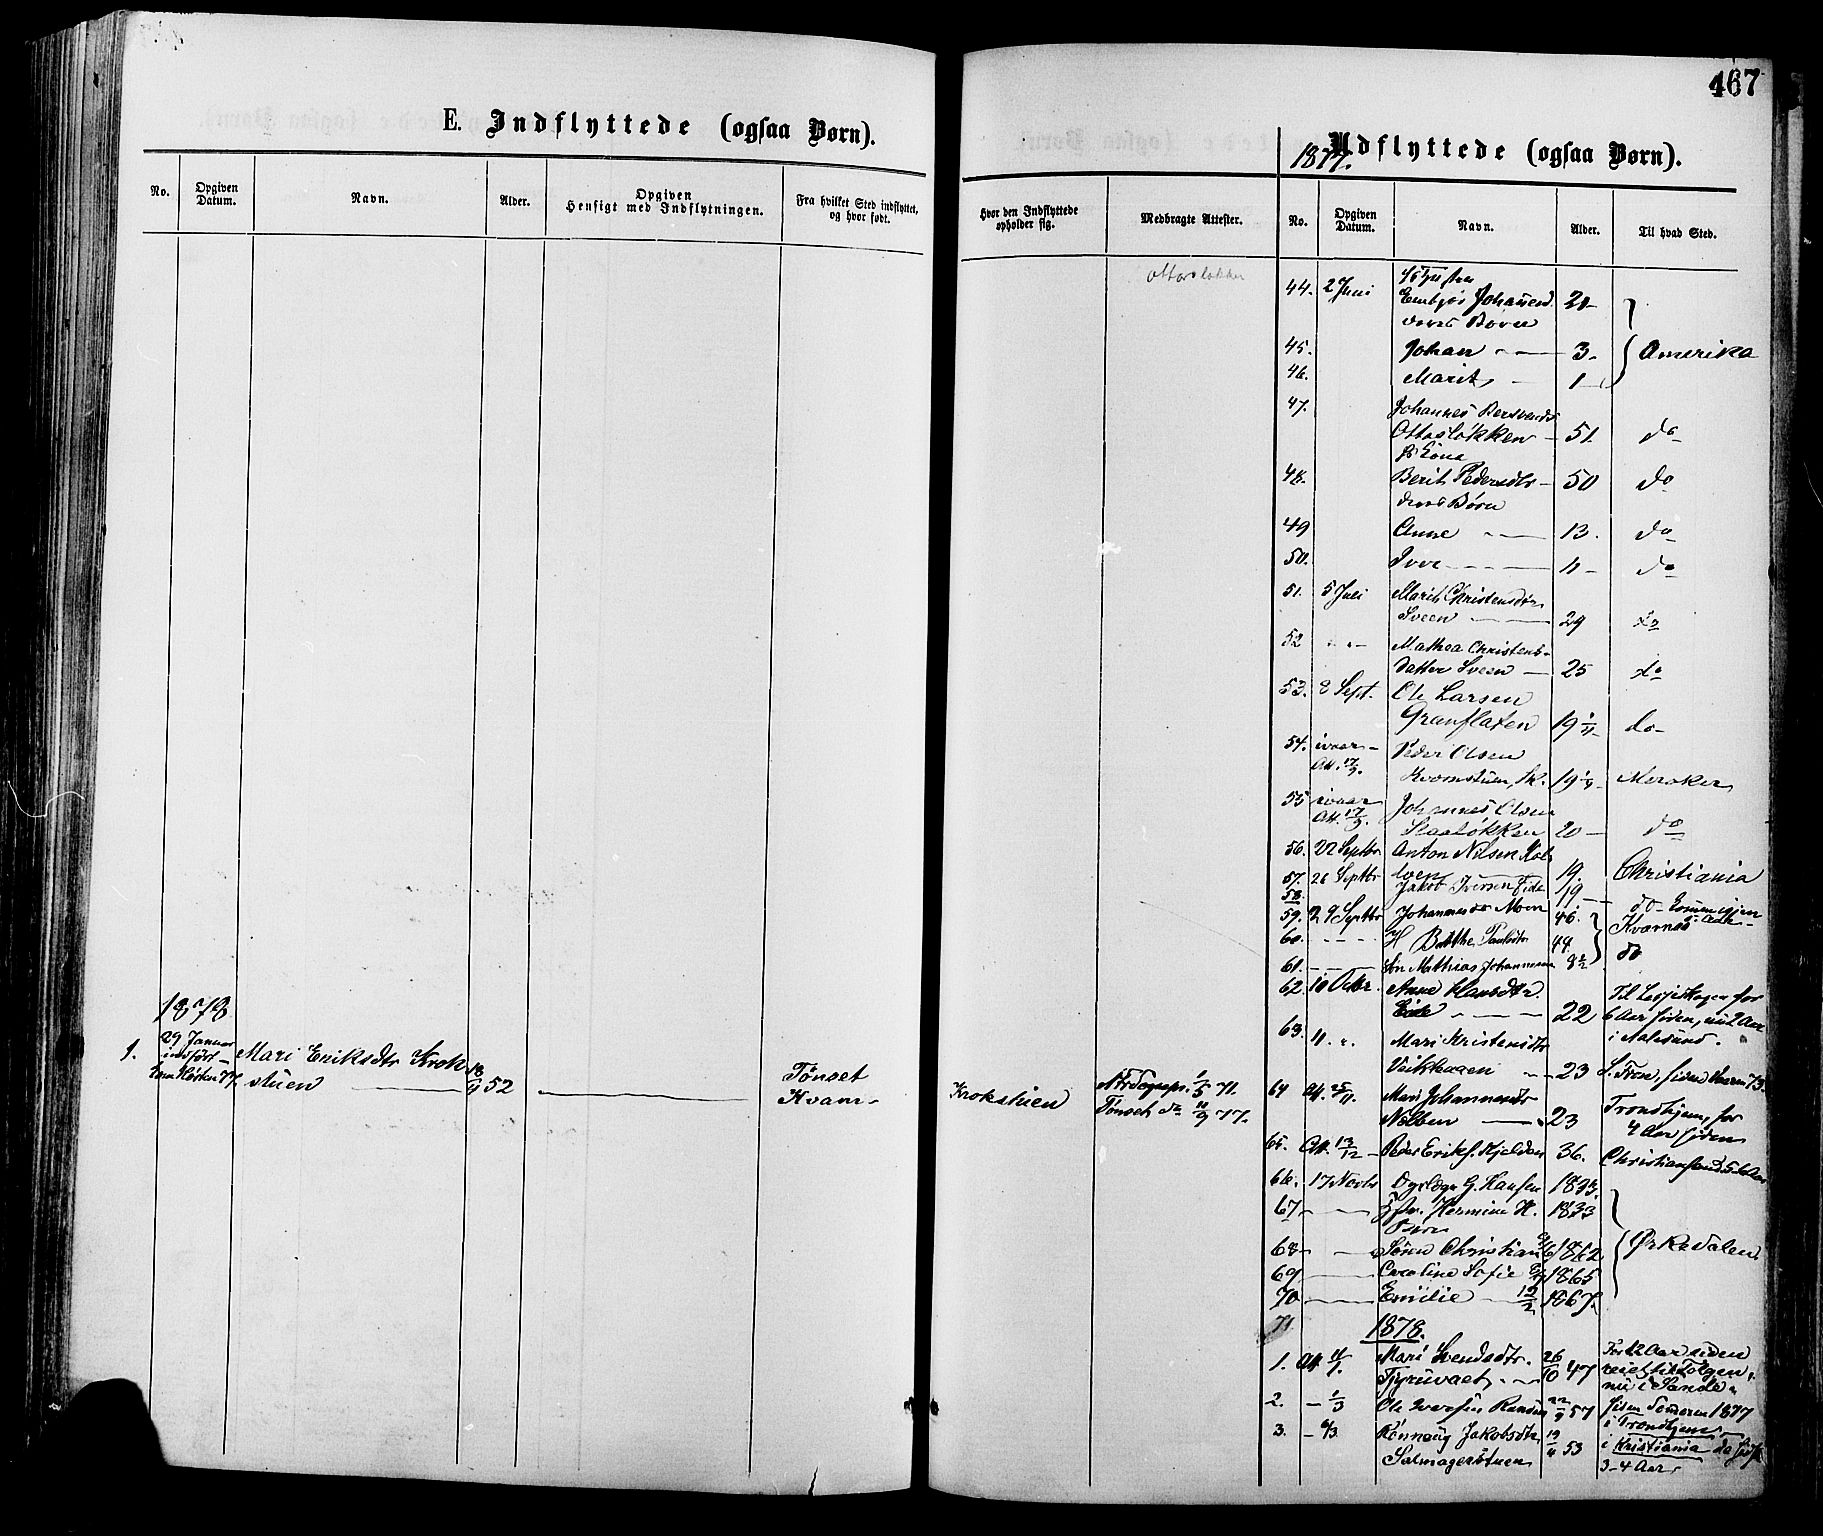 SAH, Nord-Fron prestekontor, Ministerialbok nr. 2, 1865-1883, s. 467